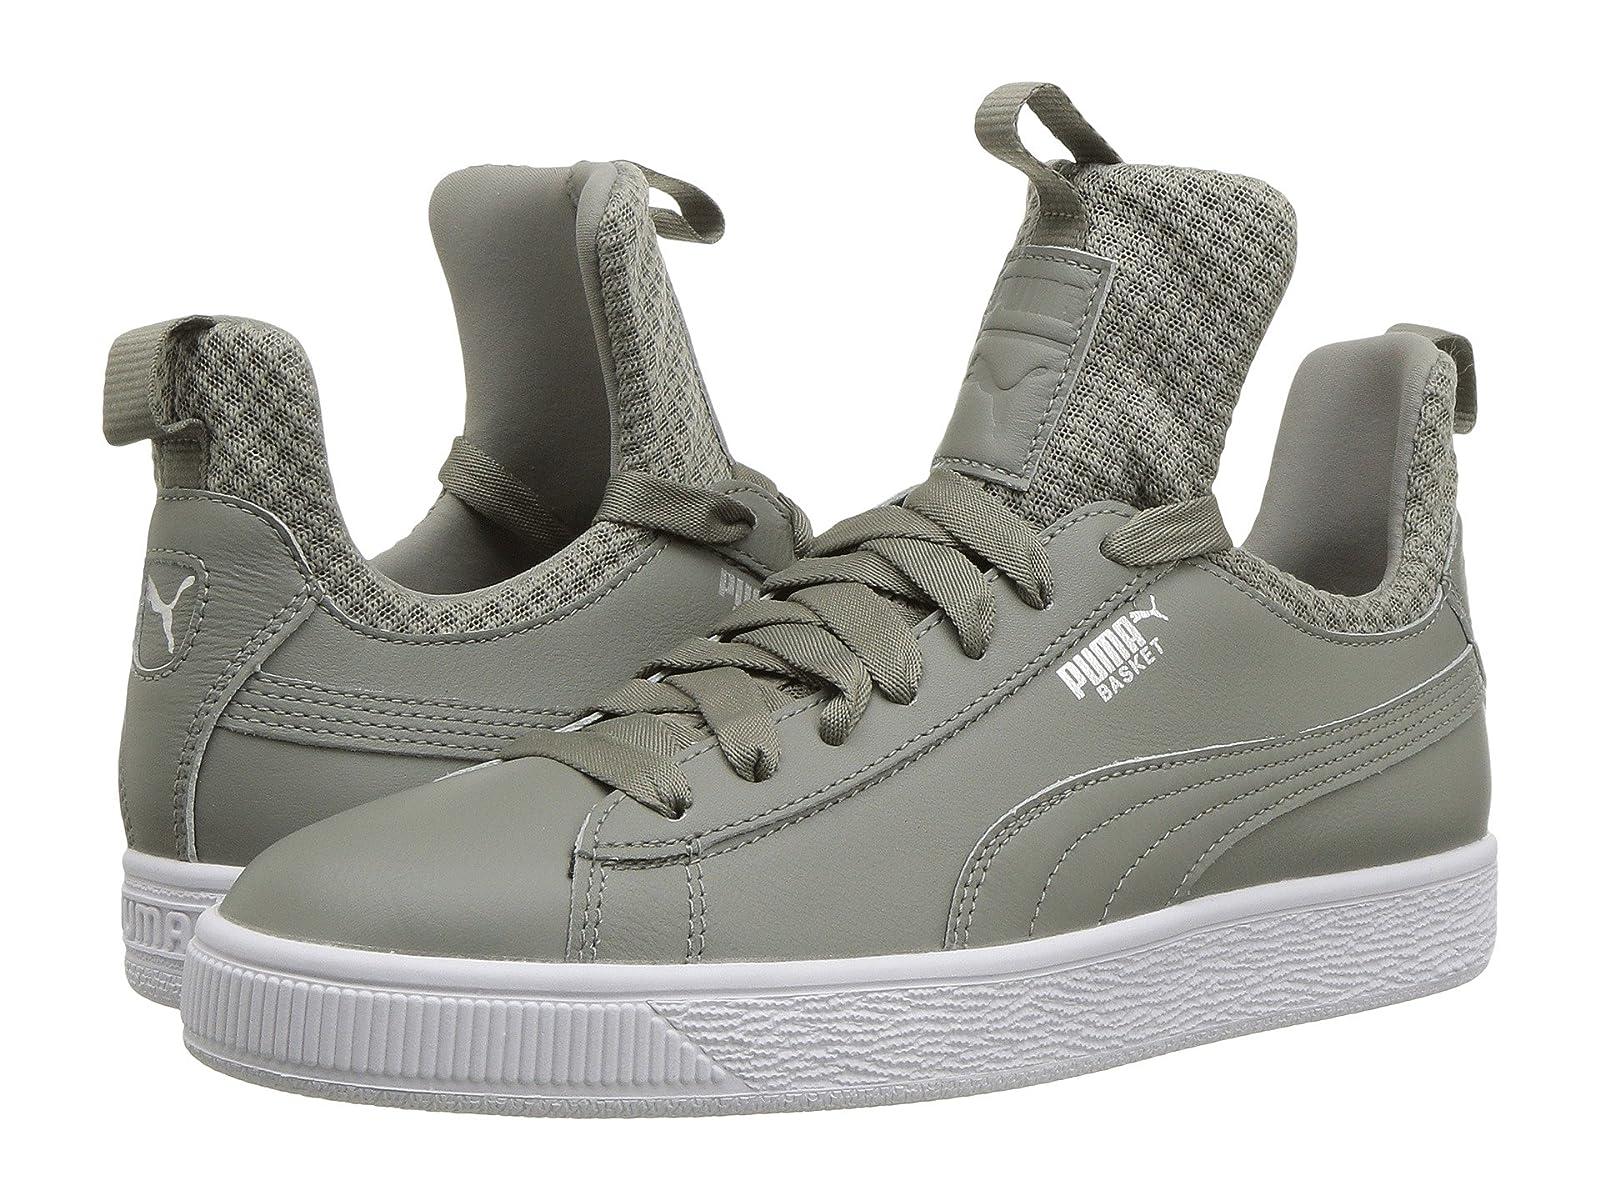 PUMA Basket Fierce EPCheap and distinctive eye-catching shoes